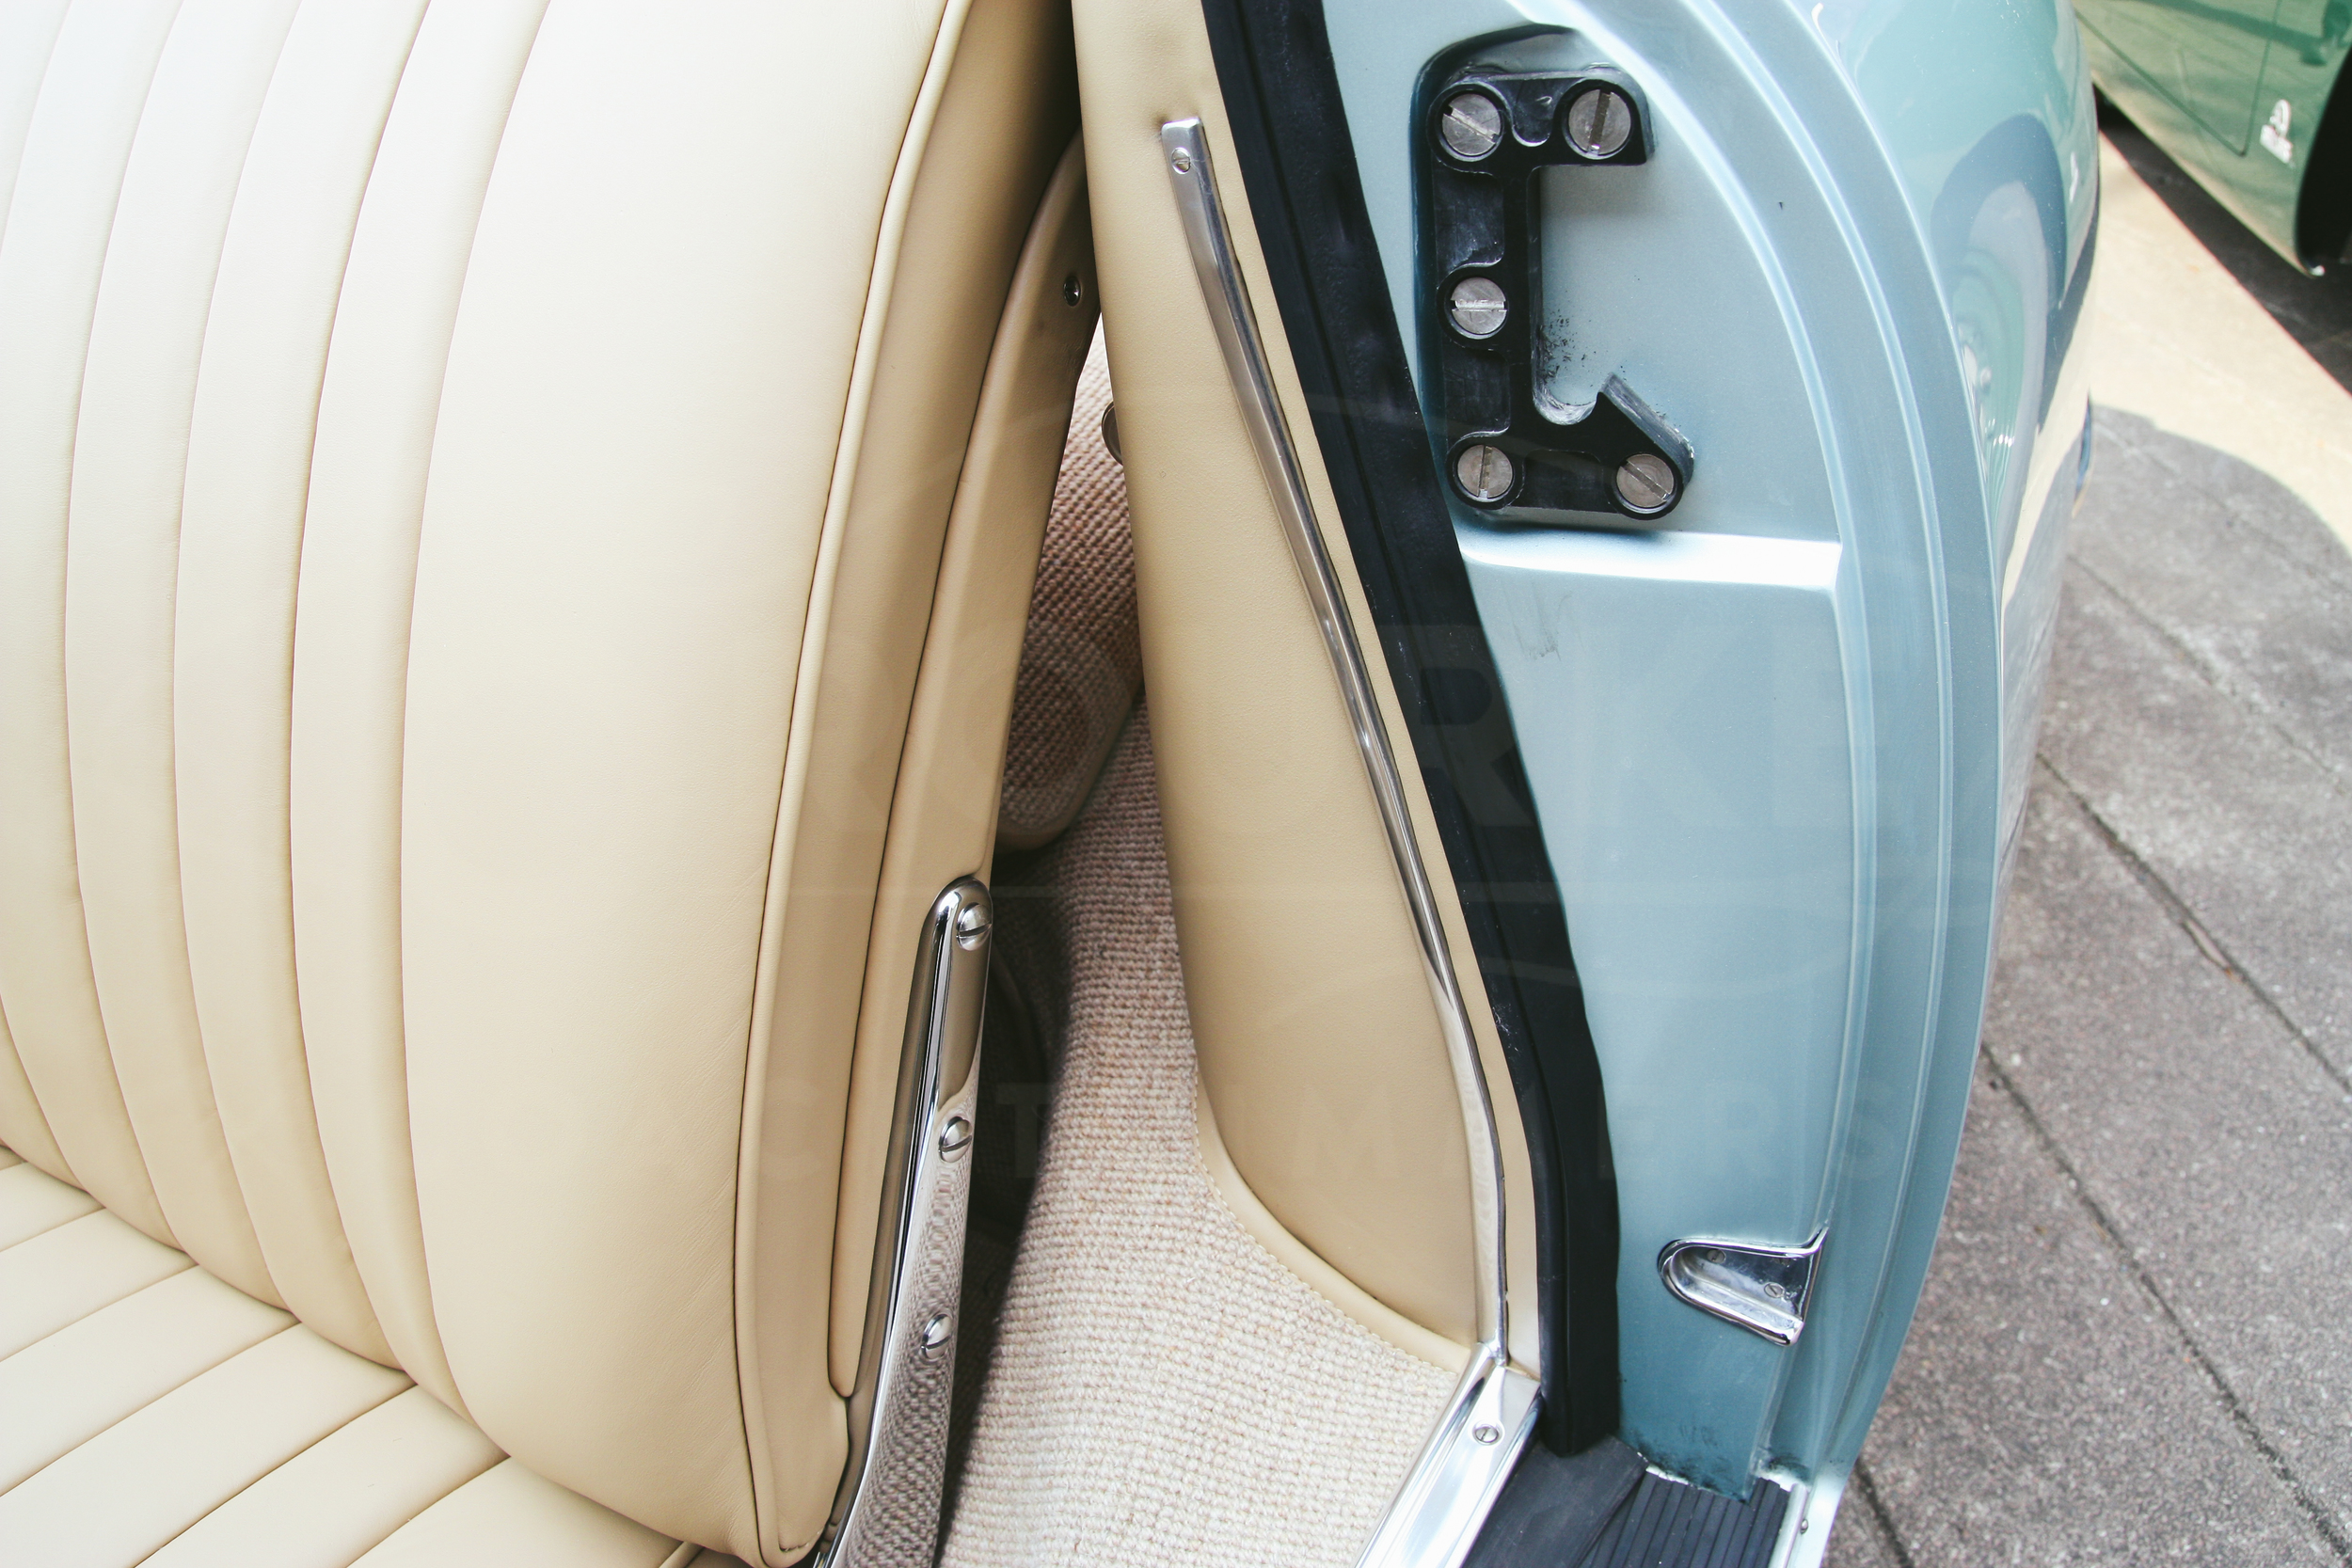 o-rourke-coachtrimmers-porsche-356-cabriolet-9.jpg